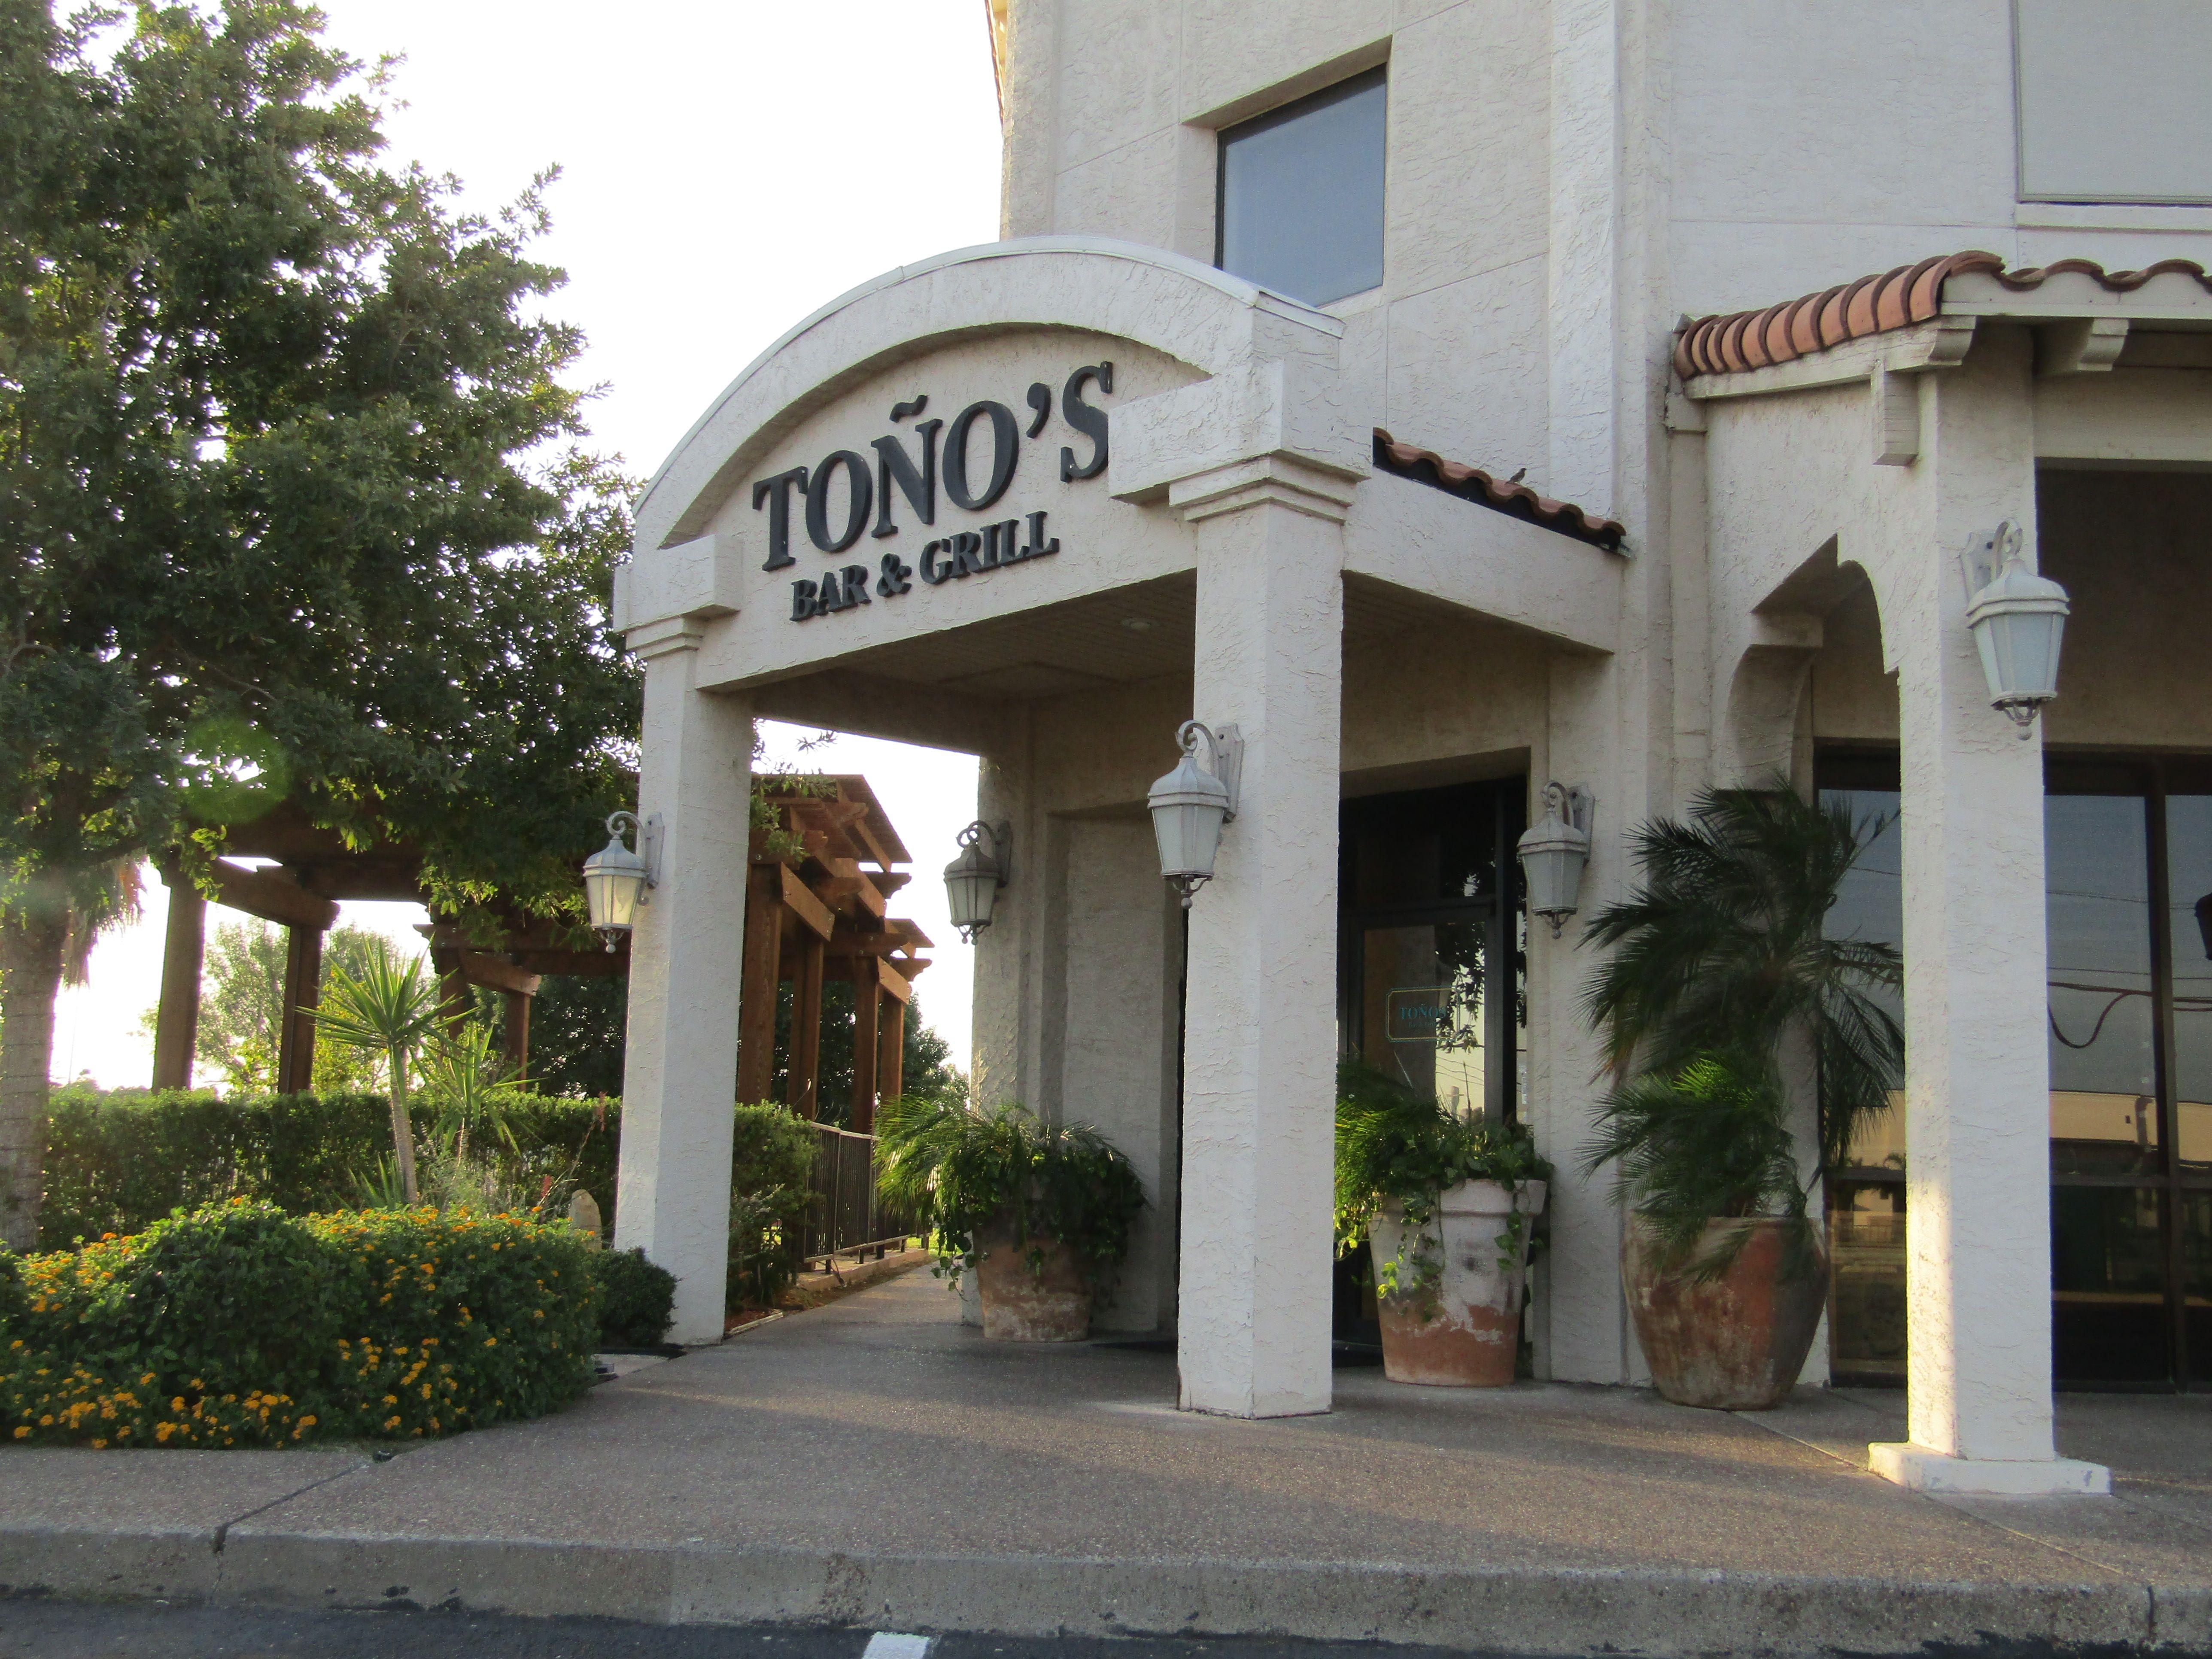 Tono S Bar And Grill 1202 E Del Mar Blvd Laredo Texas Laredo Tx South Texas Travel